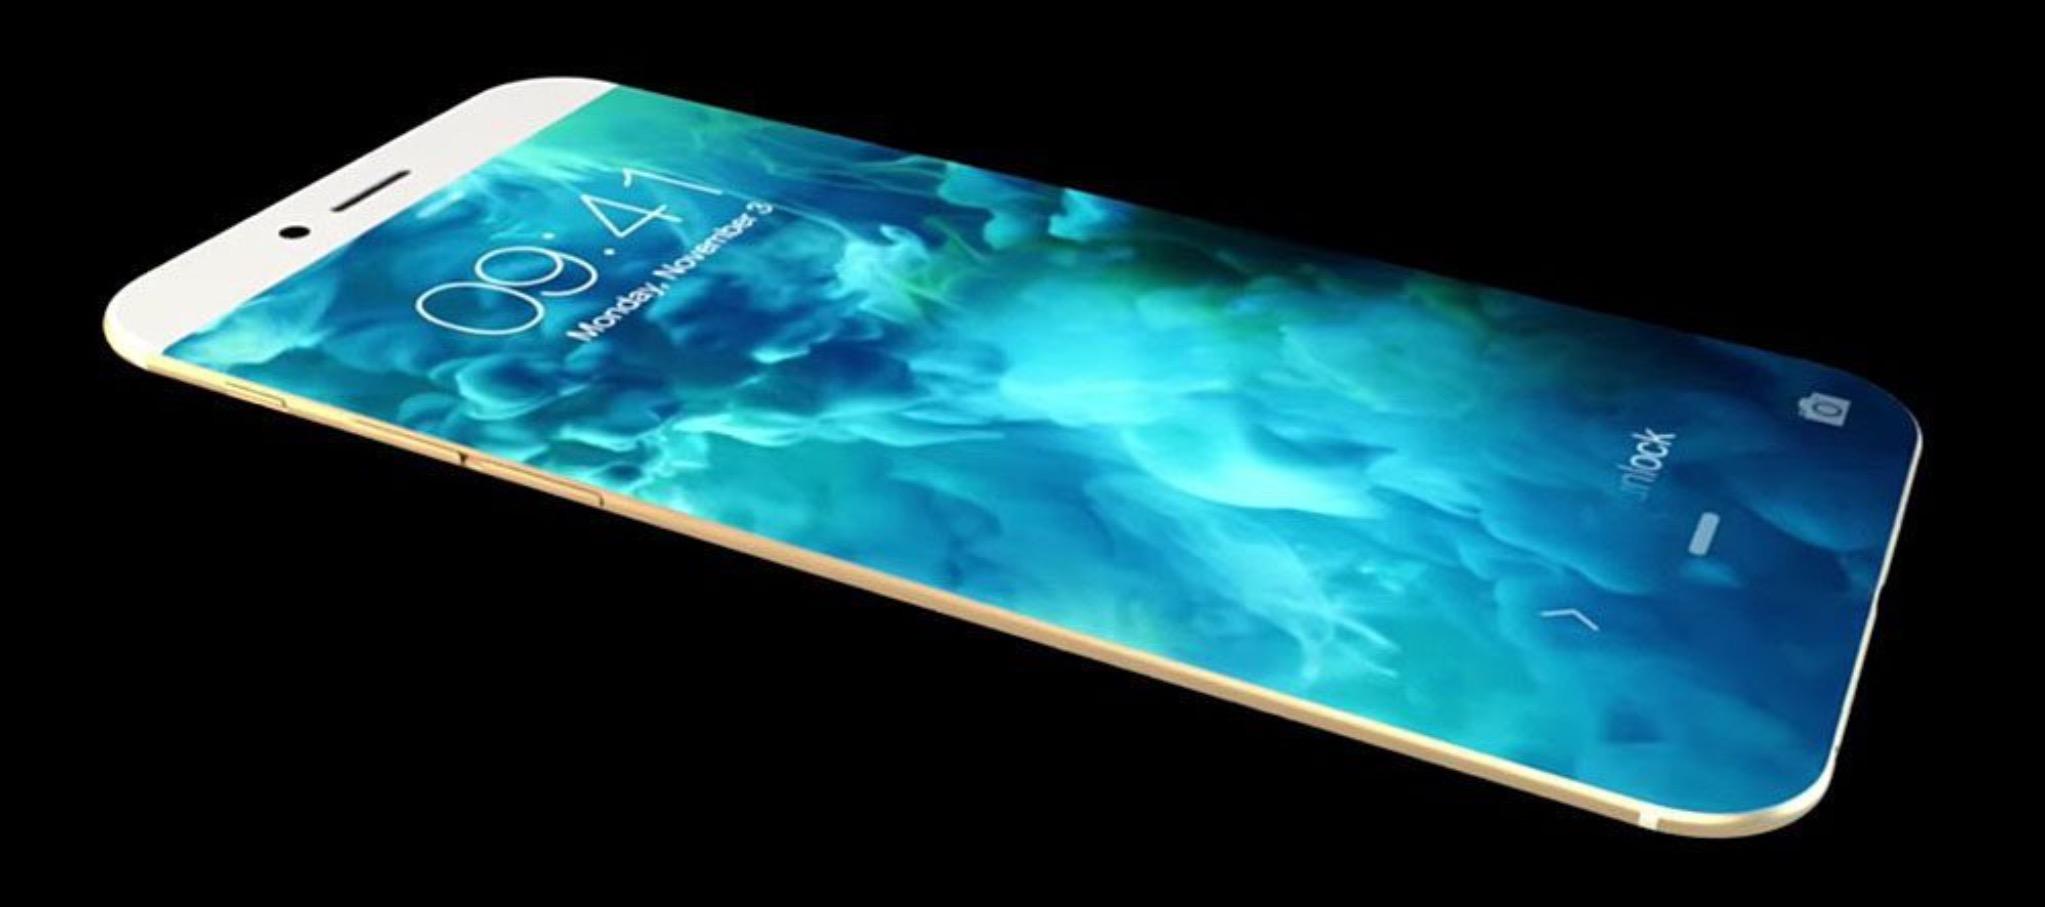 iPhone 8 Design Leaks, iPhone 8 Leaks